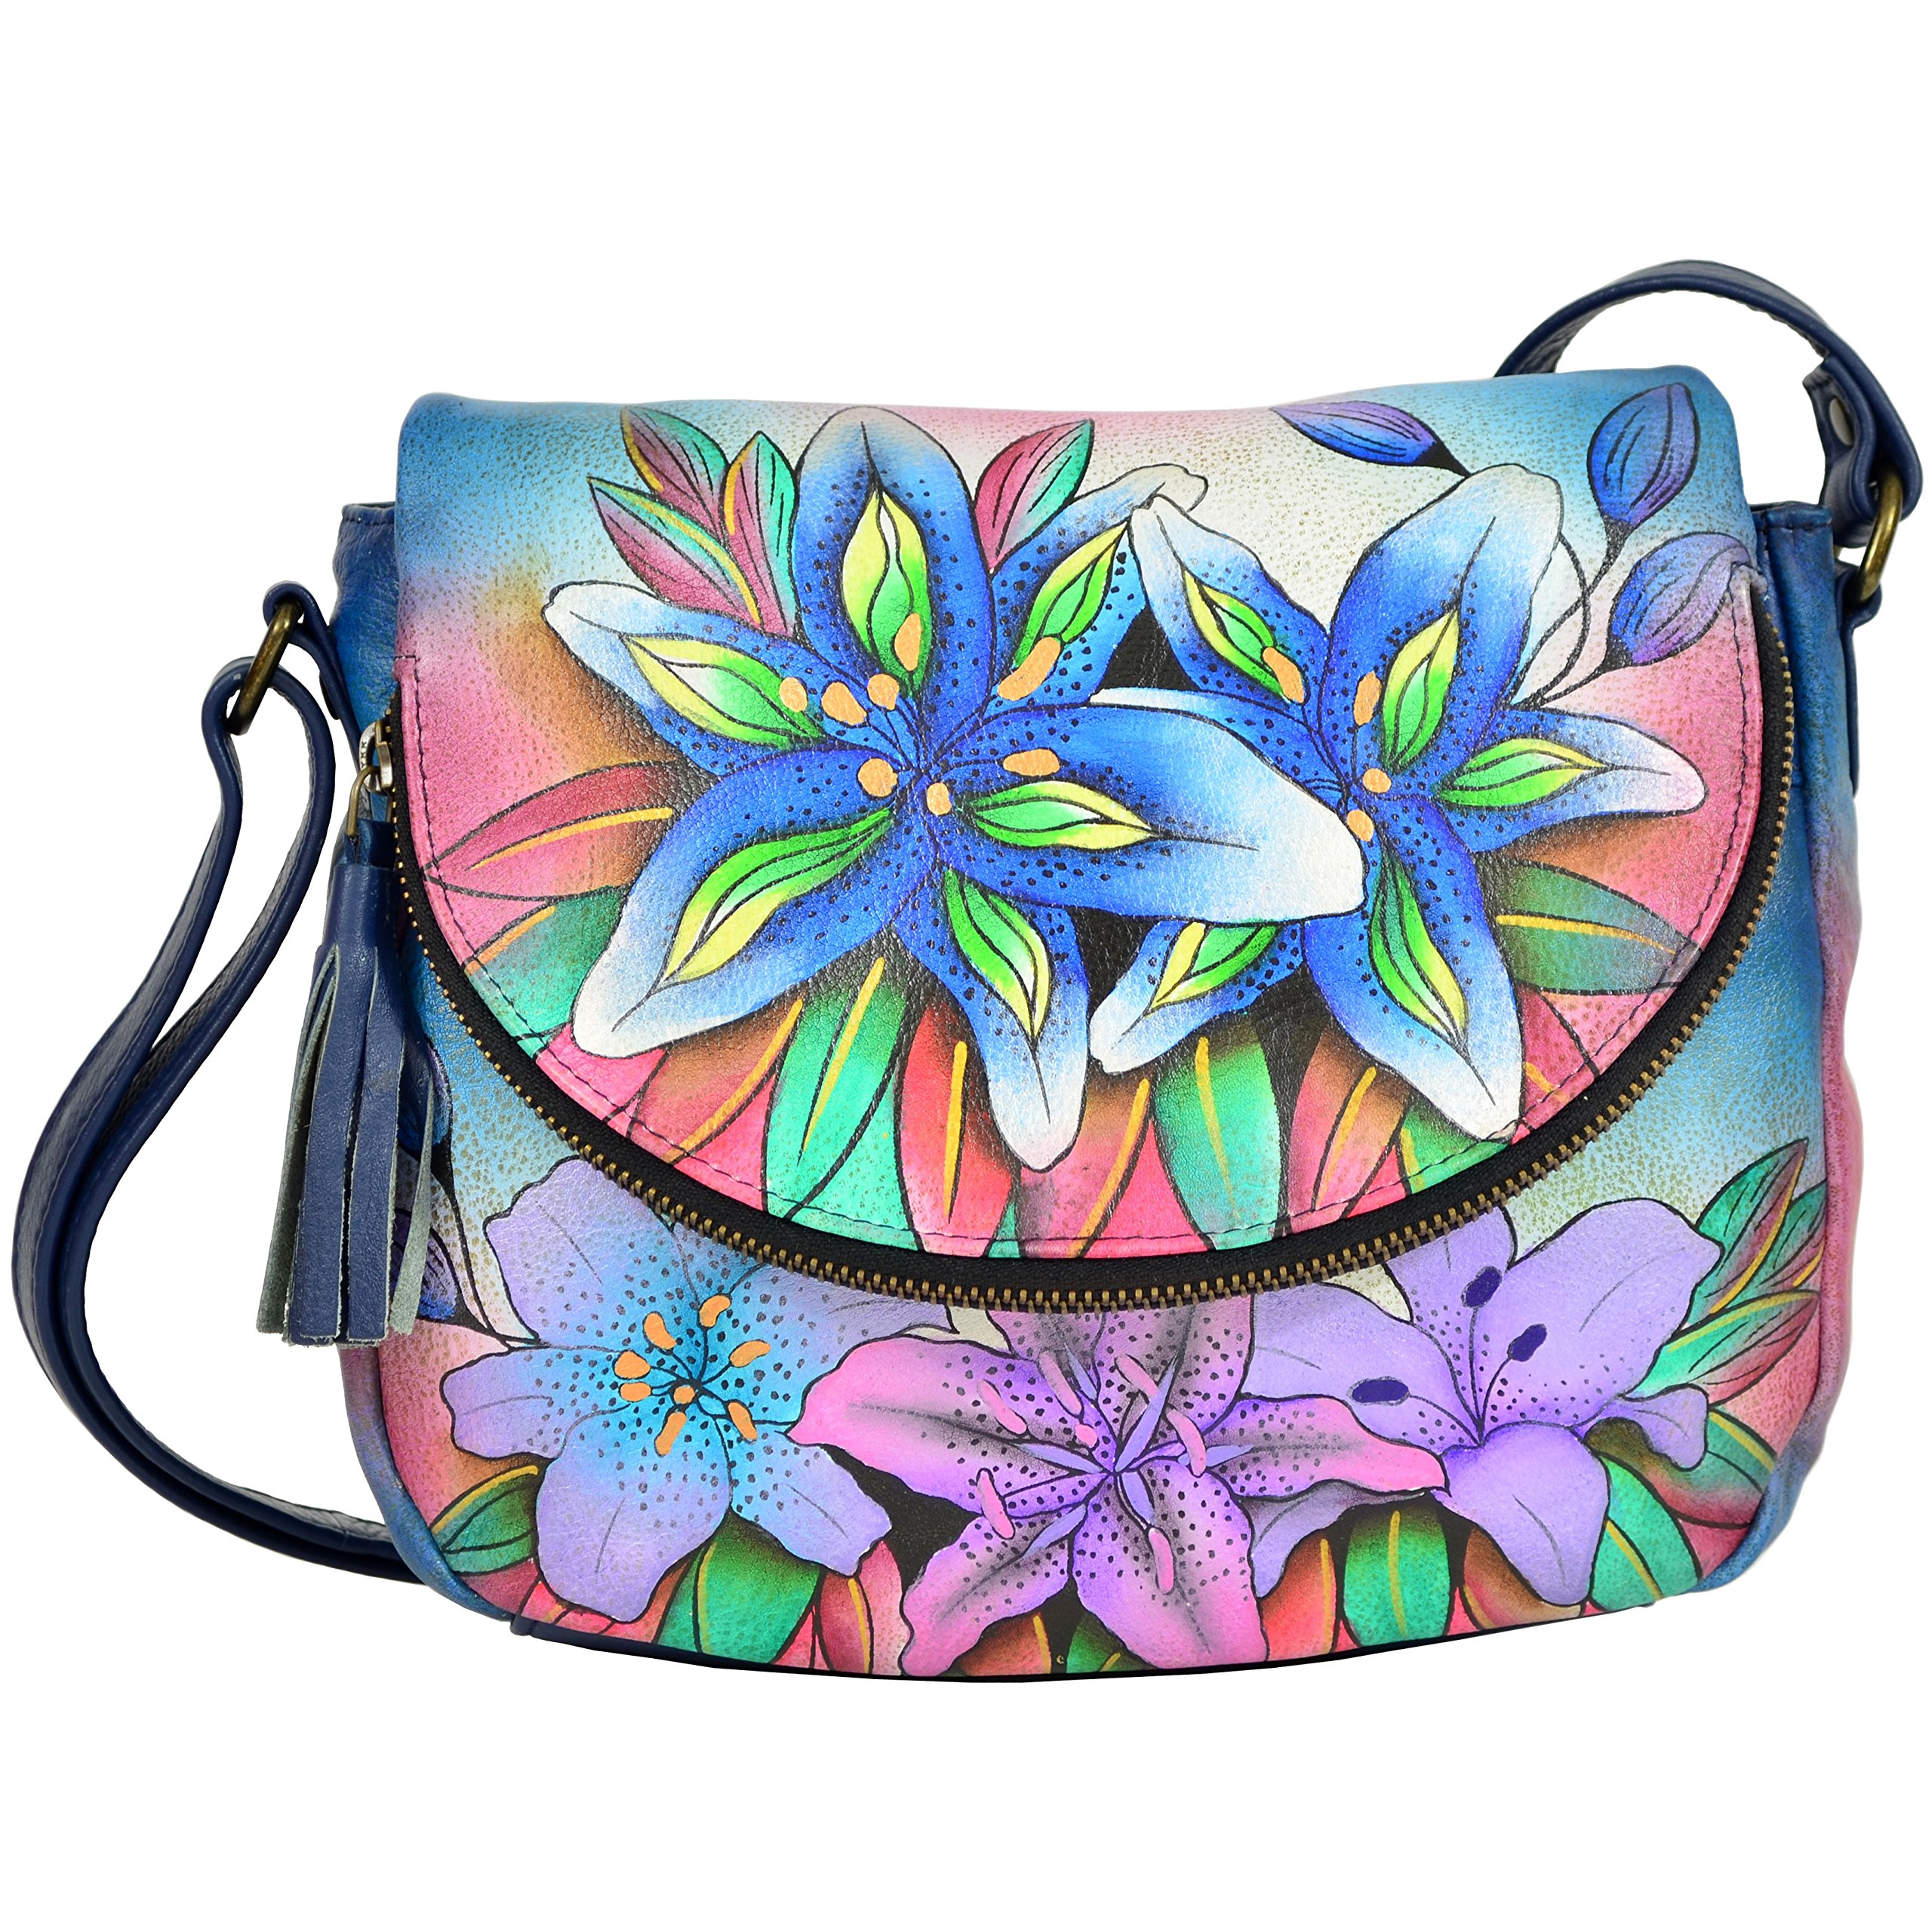 Anuschka Medium Flap Over Convertible Shoulder Bag, Luscious Lilies Denim, One Size